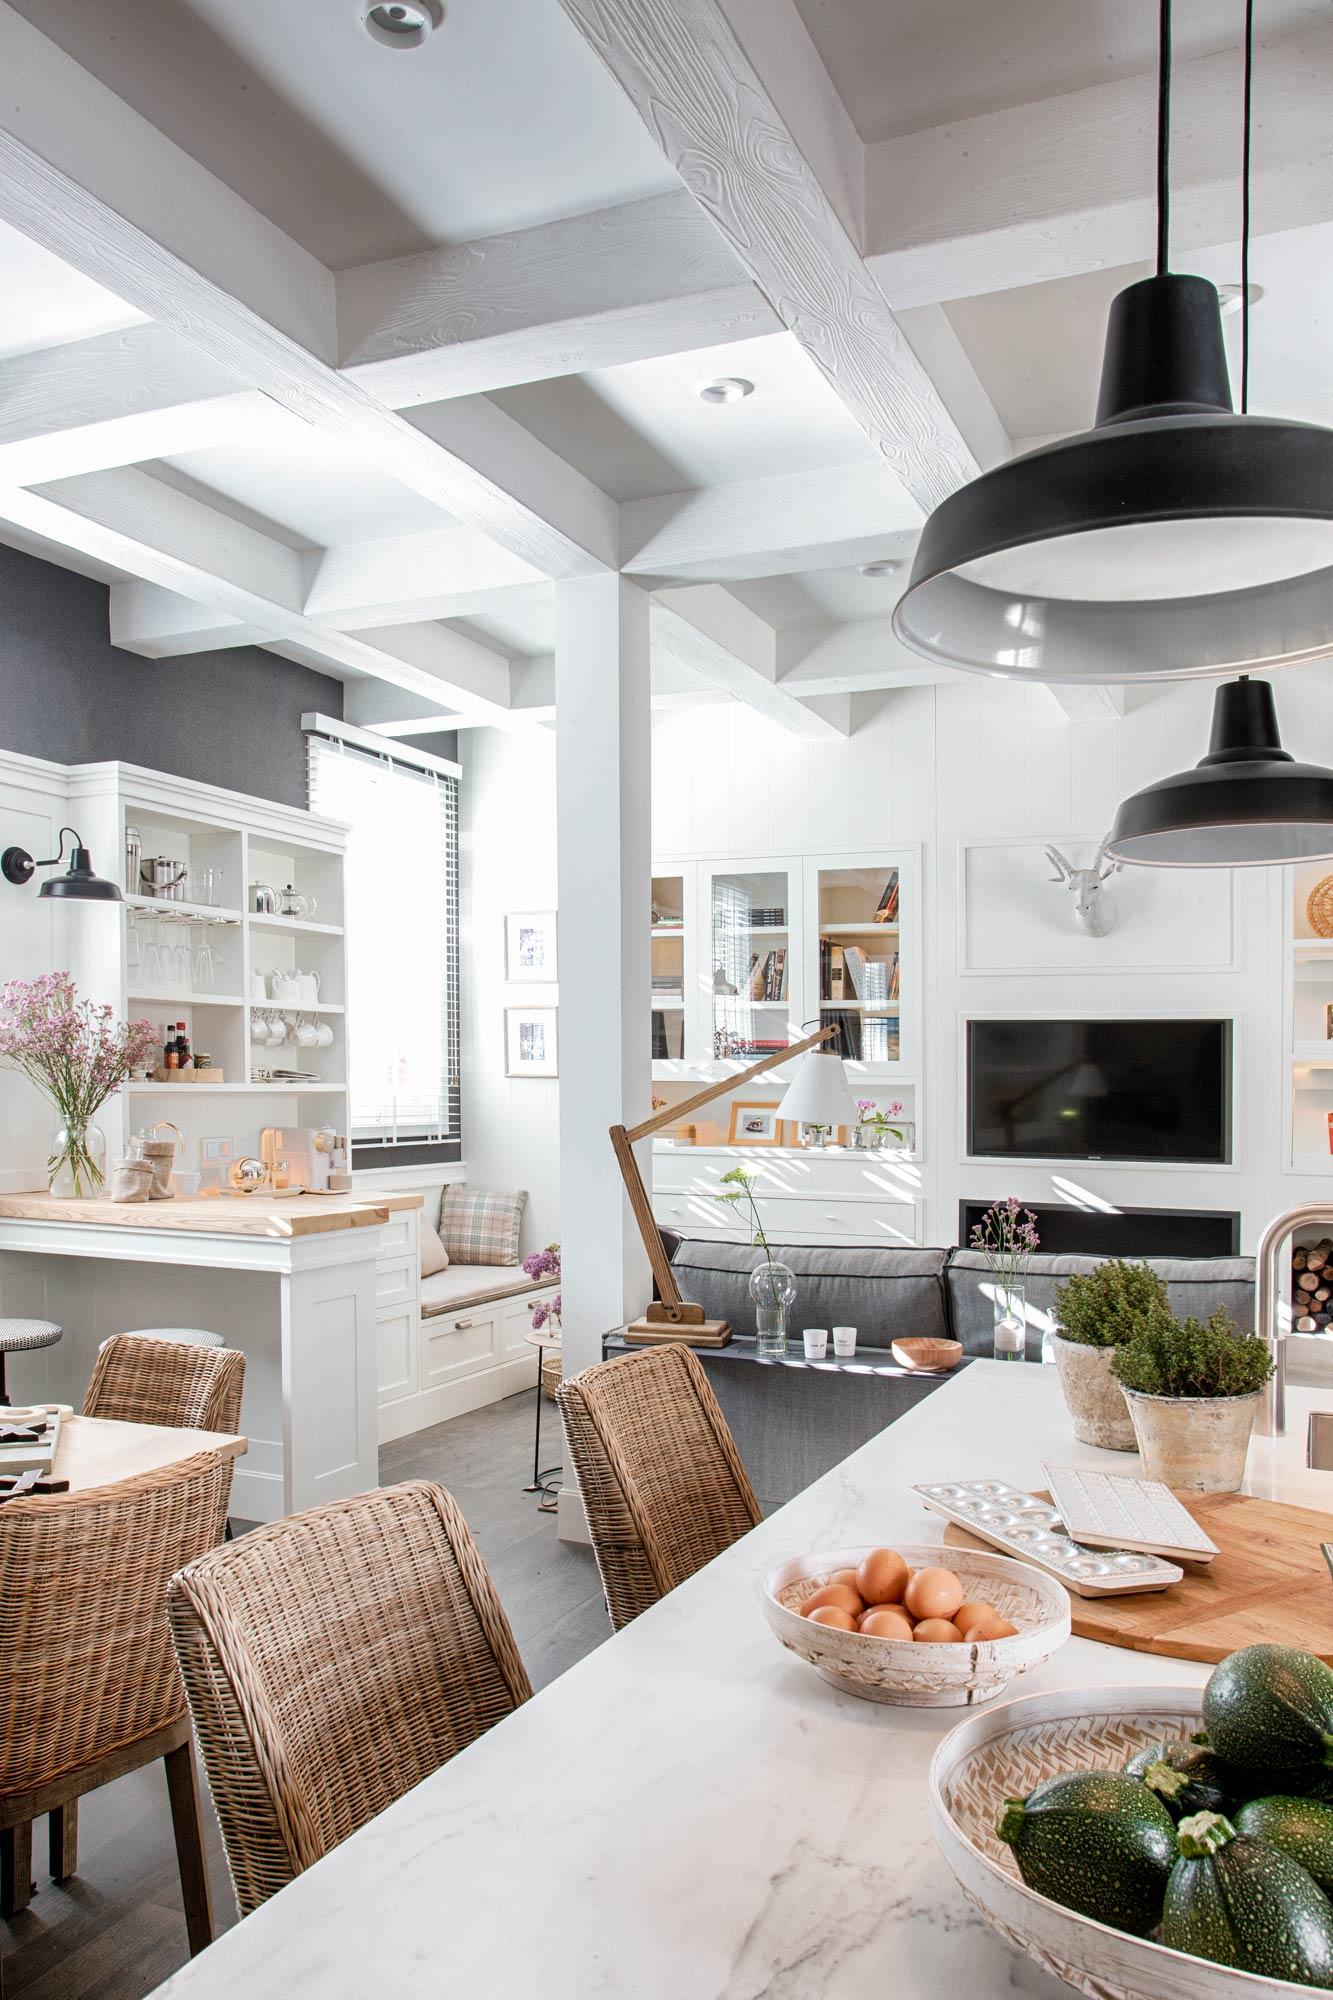 051 Cocina Comedor Deulonder Casa Decor 2019 Cocina Barcelona